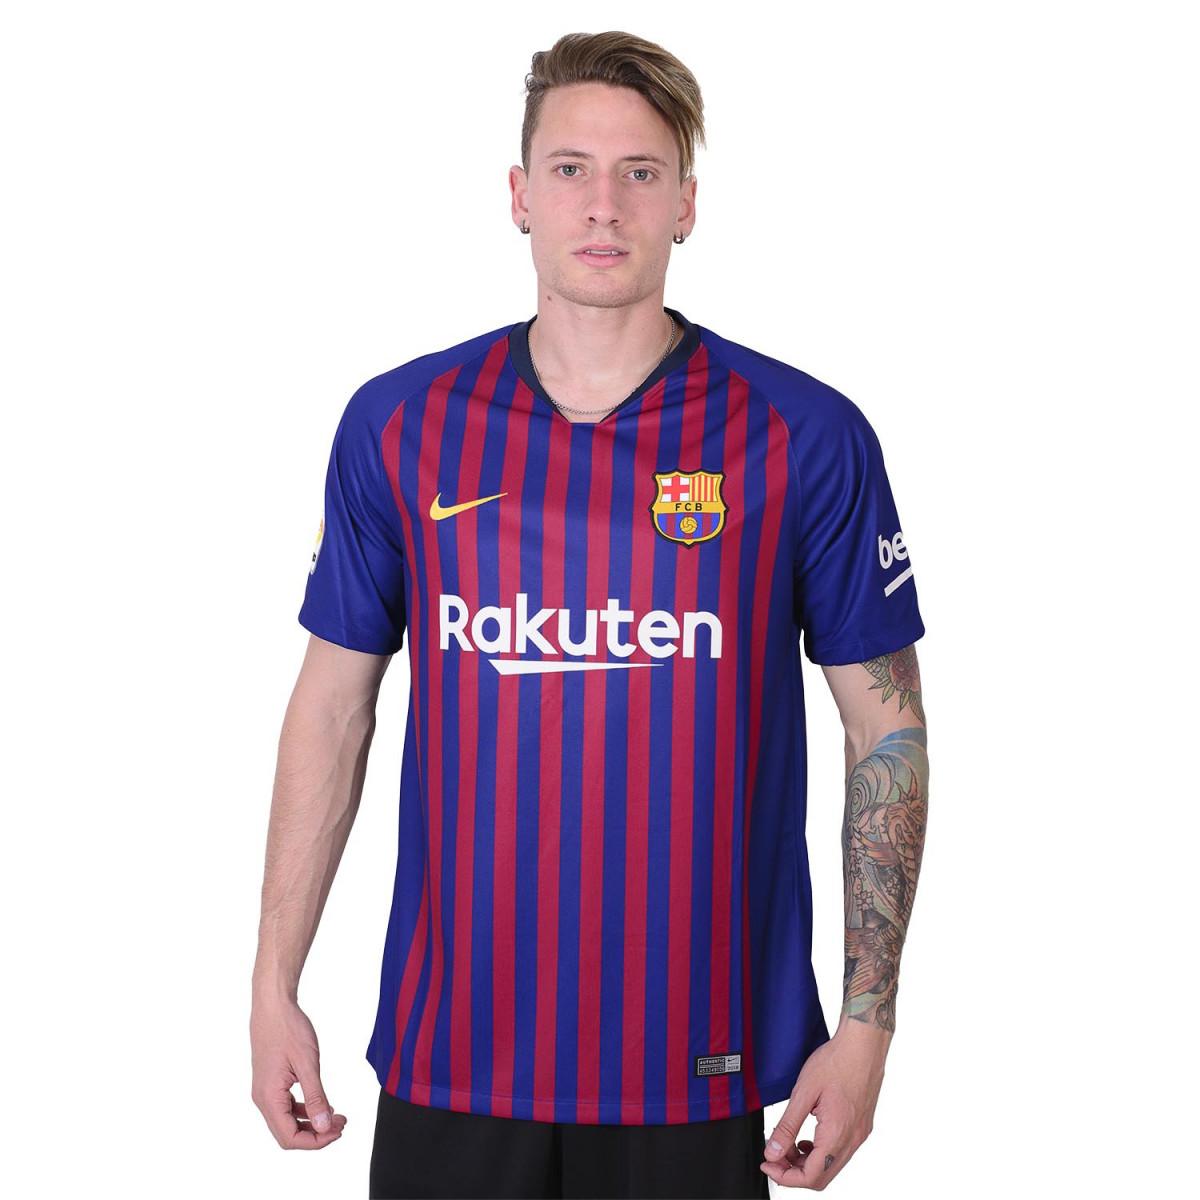 buy online 80377 6f1cb Camiseta Nike Fc Barcelona Stadium Home 20182019